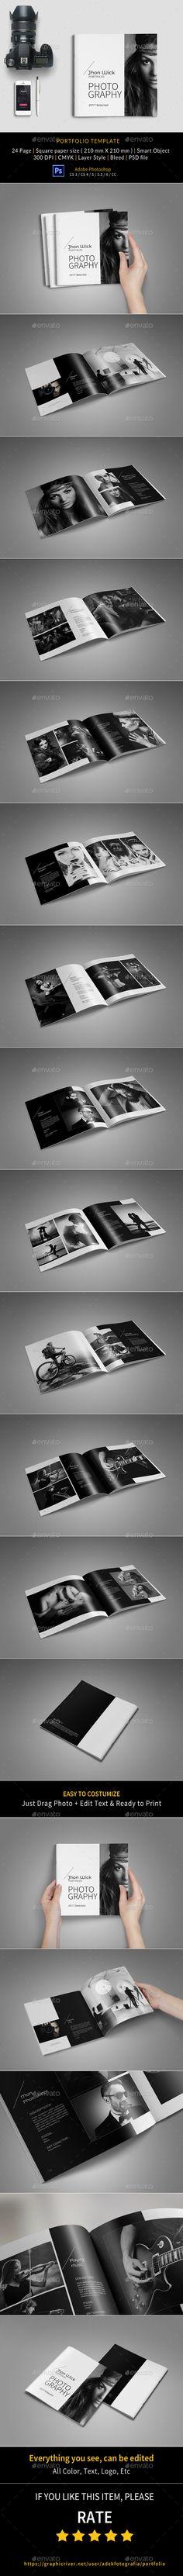 Portfolio Photographer - Portfolio Brochures Download here : https://graphicriver.net/item/portfolio-photographer/19414609?s_rank=139&ref=Al-fatih